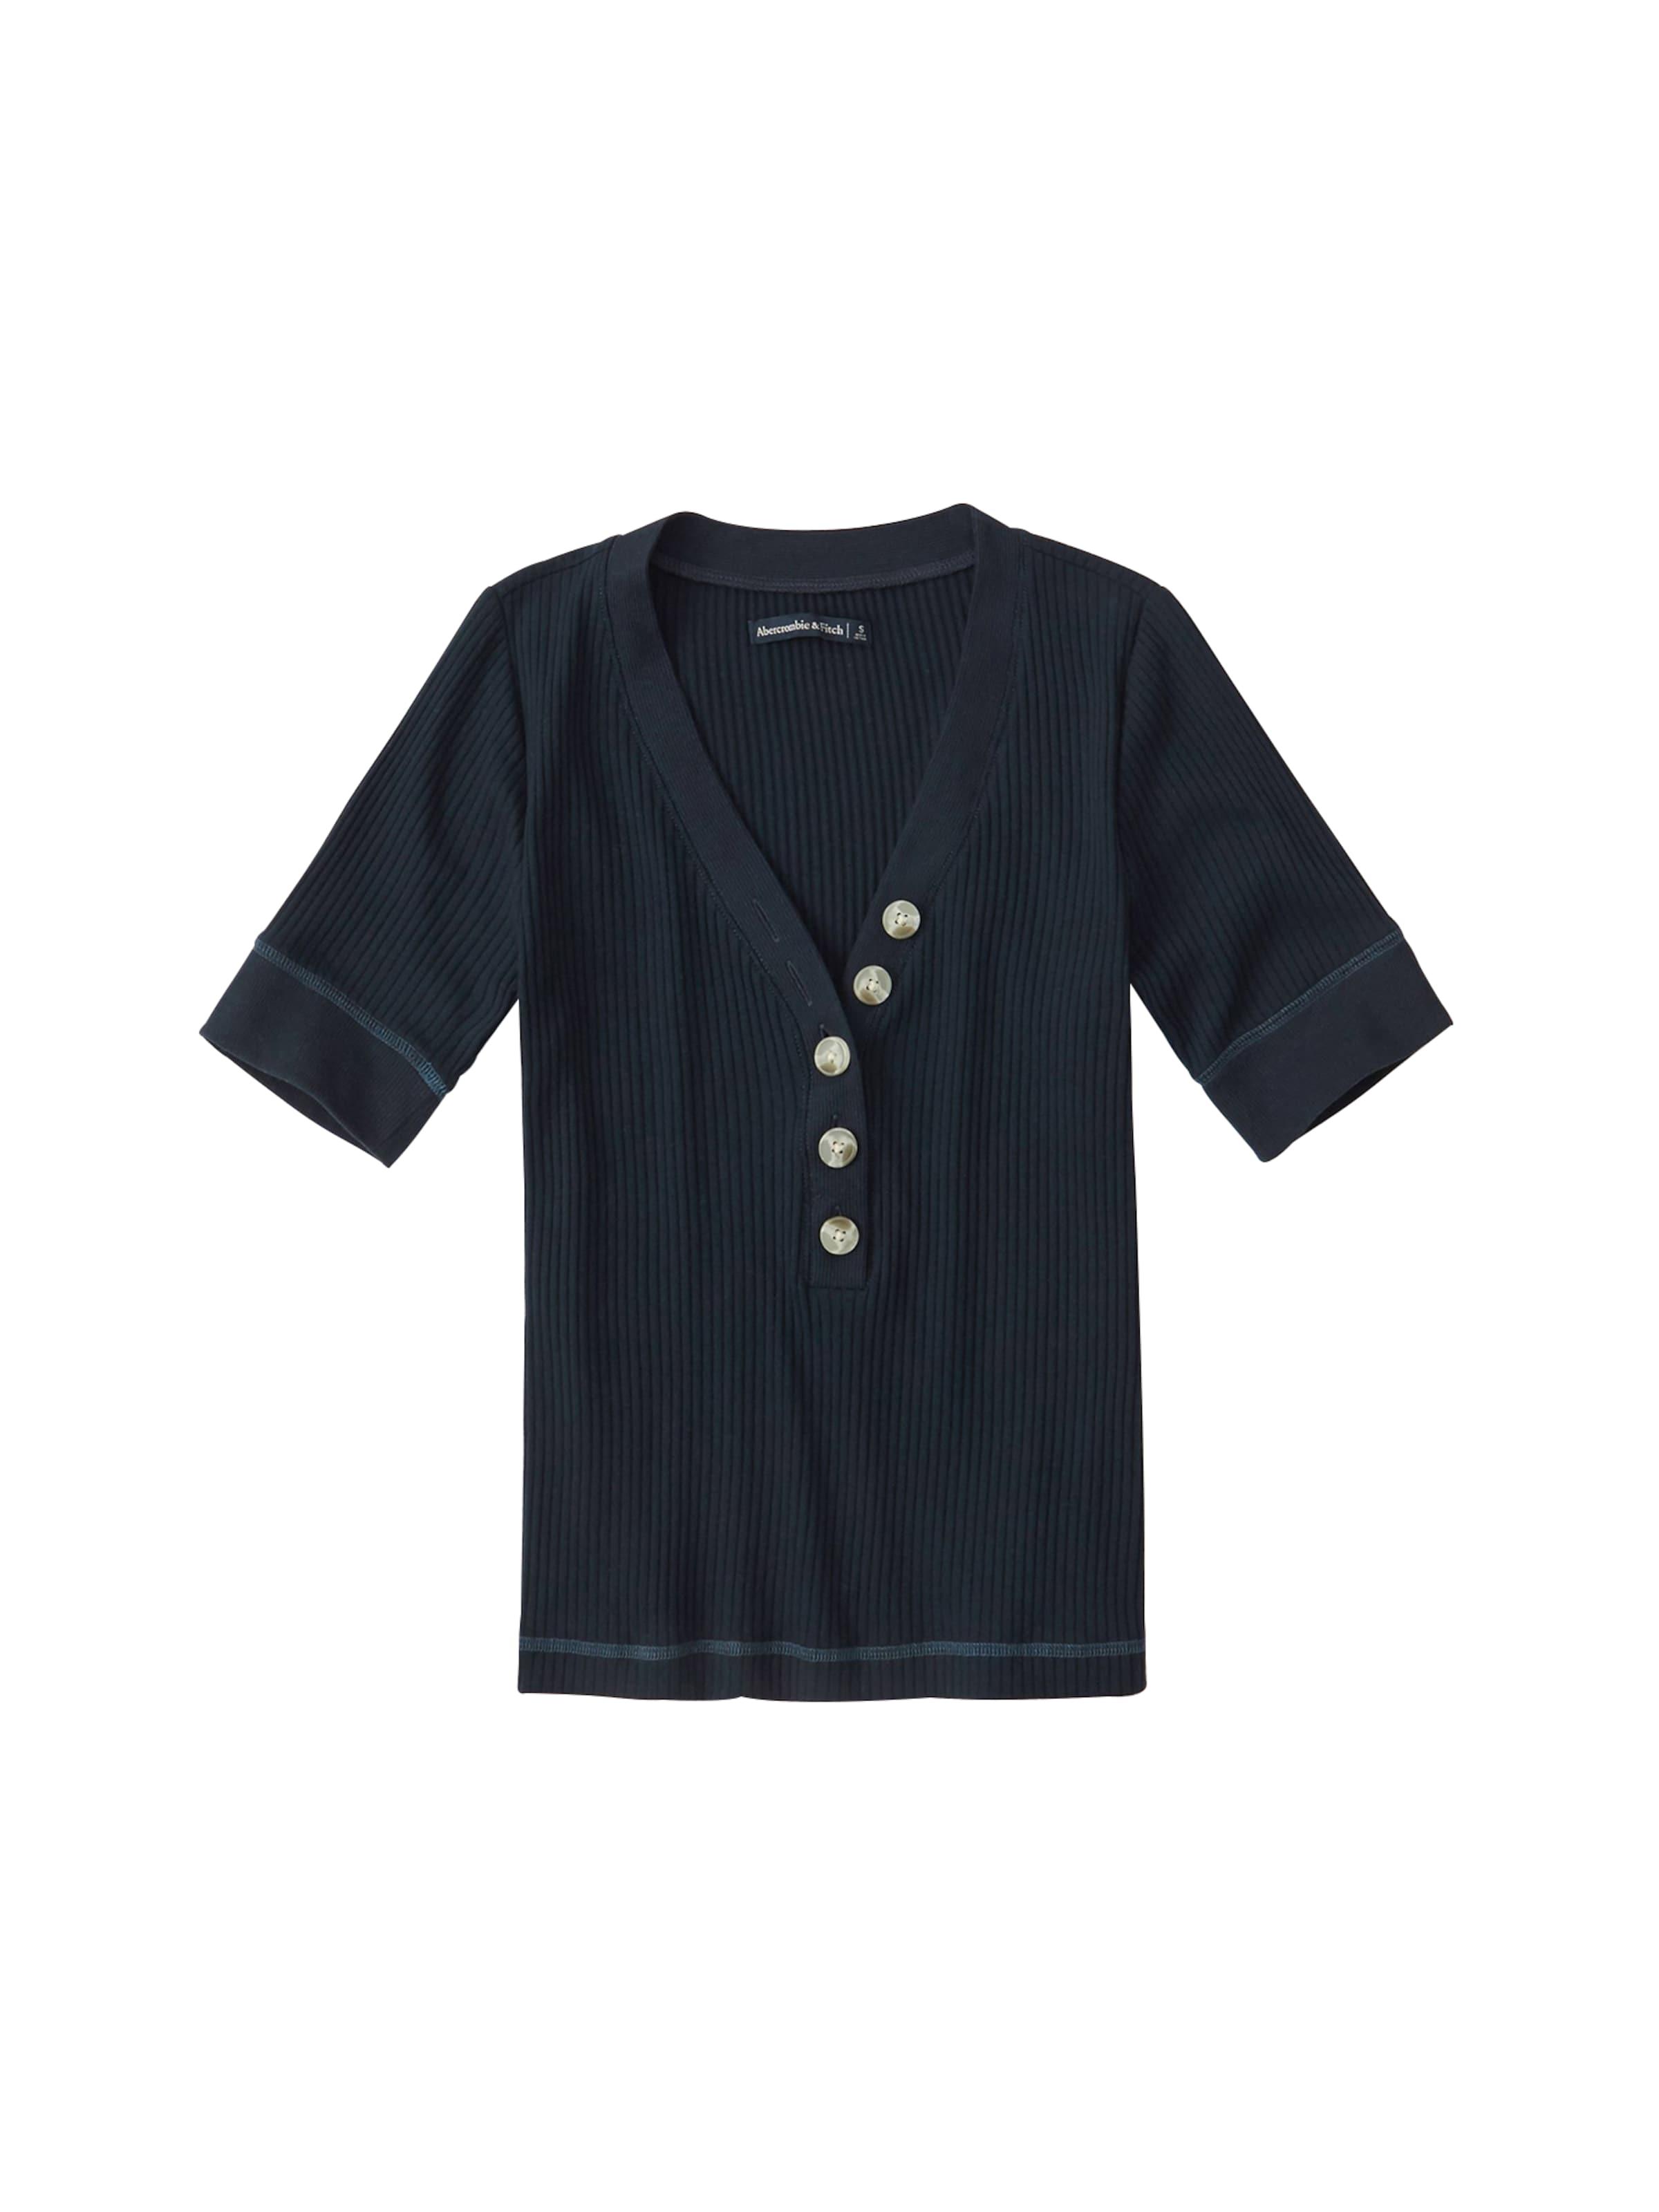 T shirt Bleu Marine Abercrombieamp; Fitch En 0PkwOn